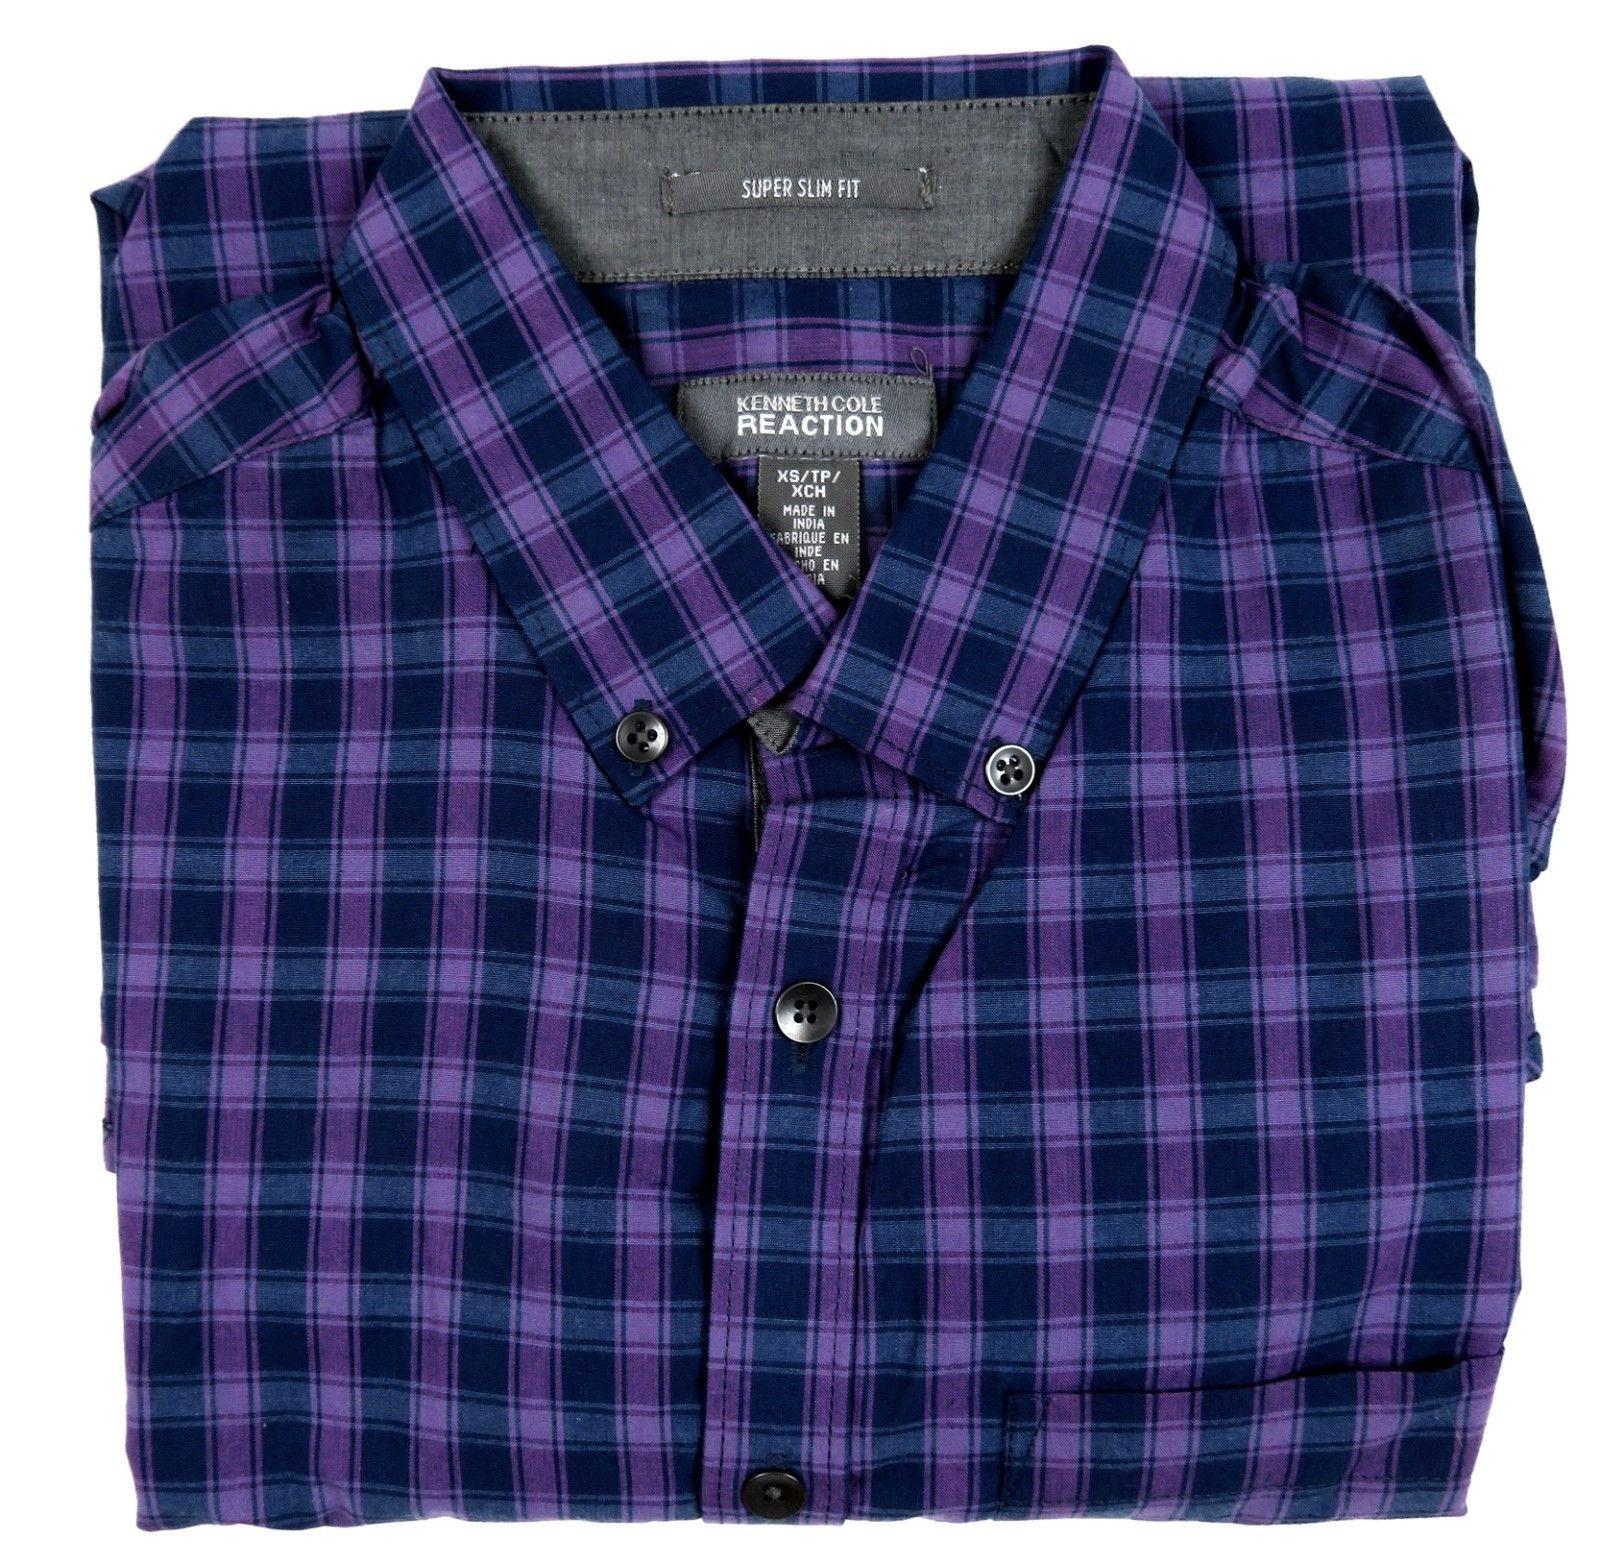 Kenneth Cole Reaction Shirt Men's Super Slim Fit Long Sleeve Button-down #23